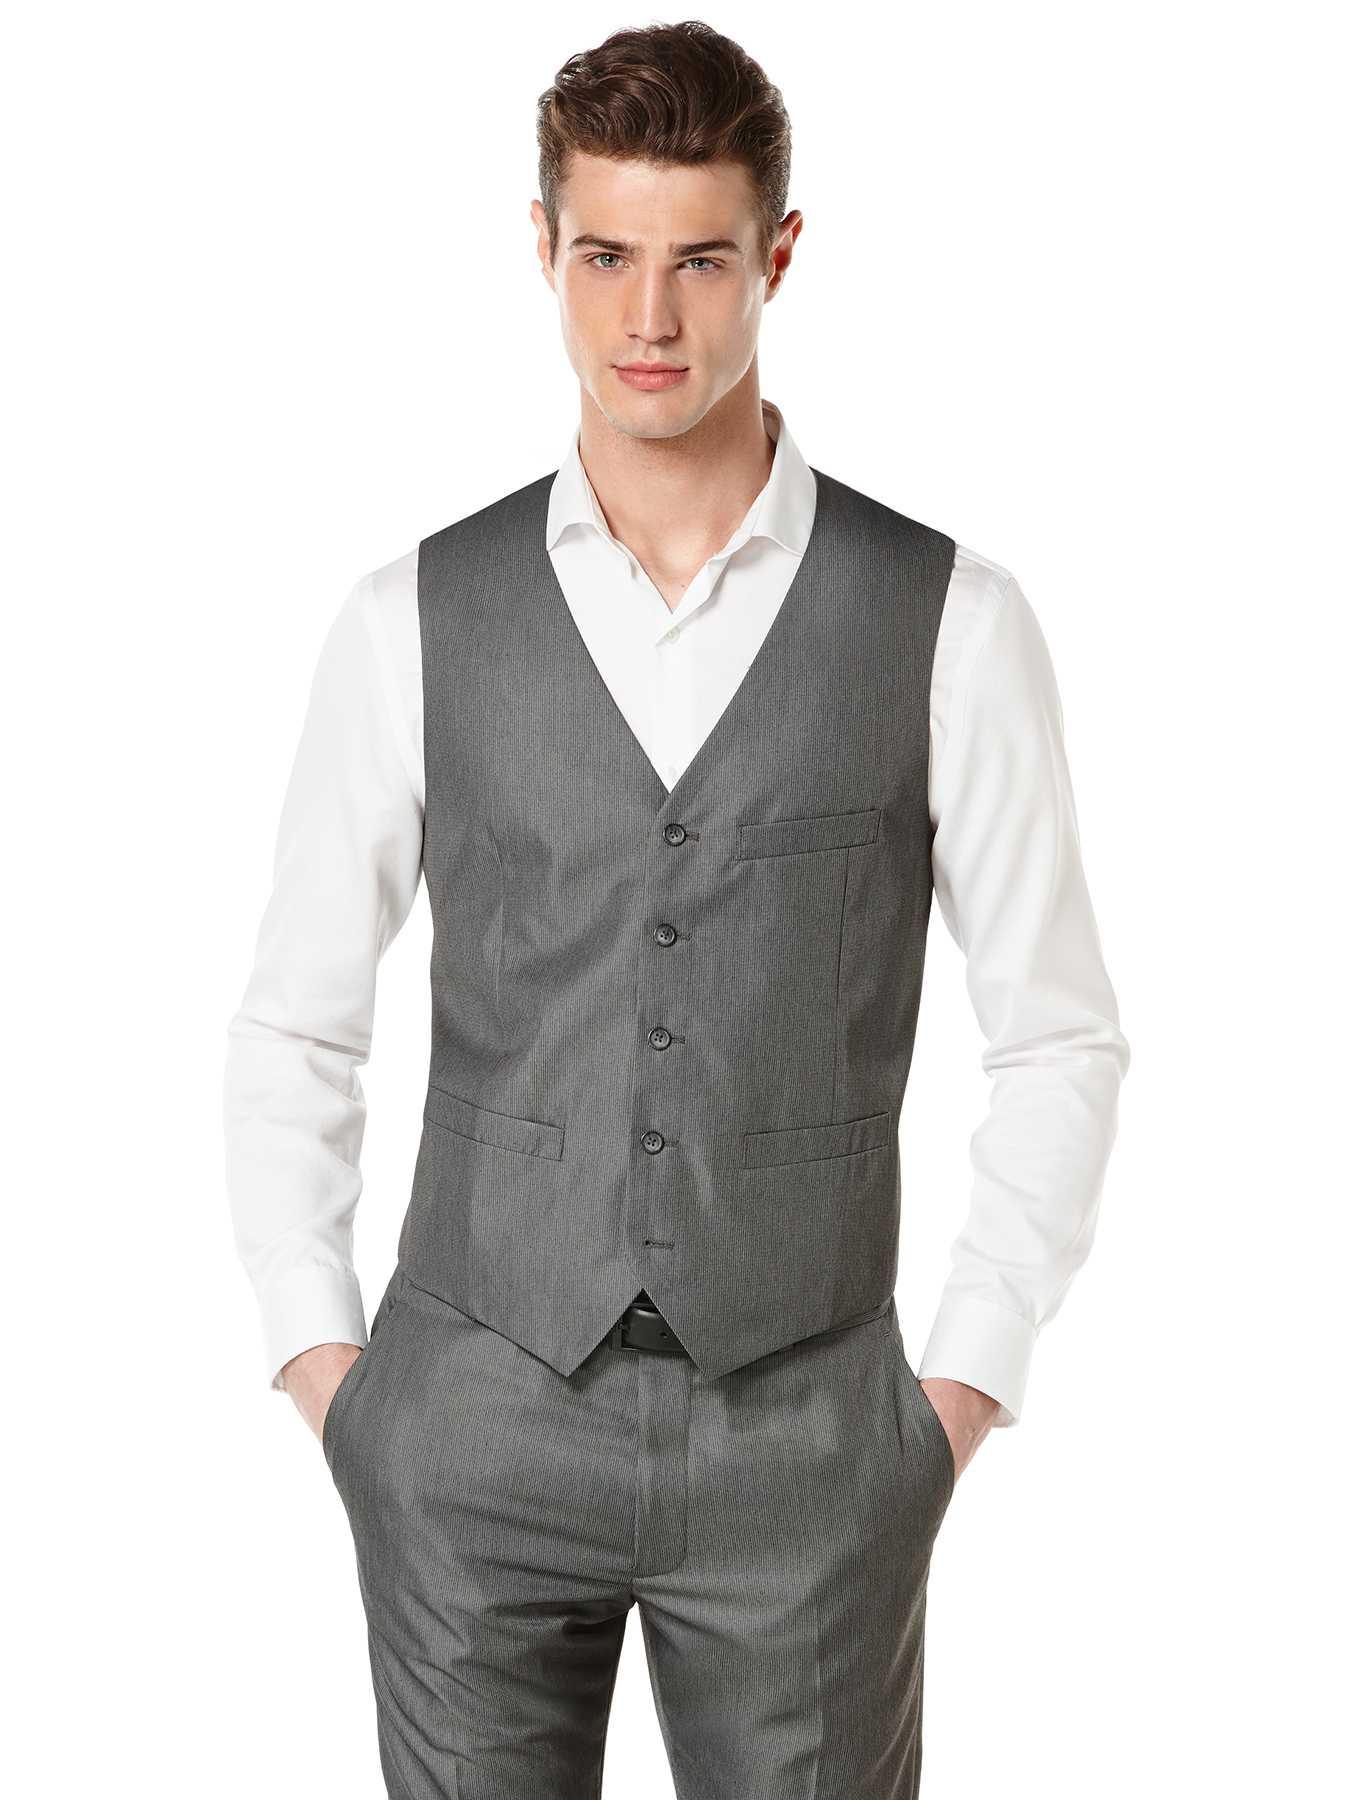 Perry Ellis Micro Twill Heather Suit Vest